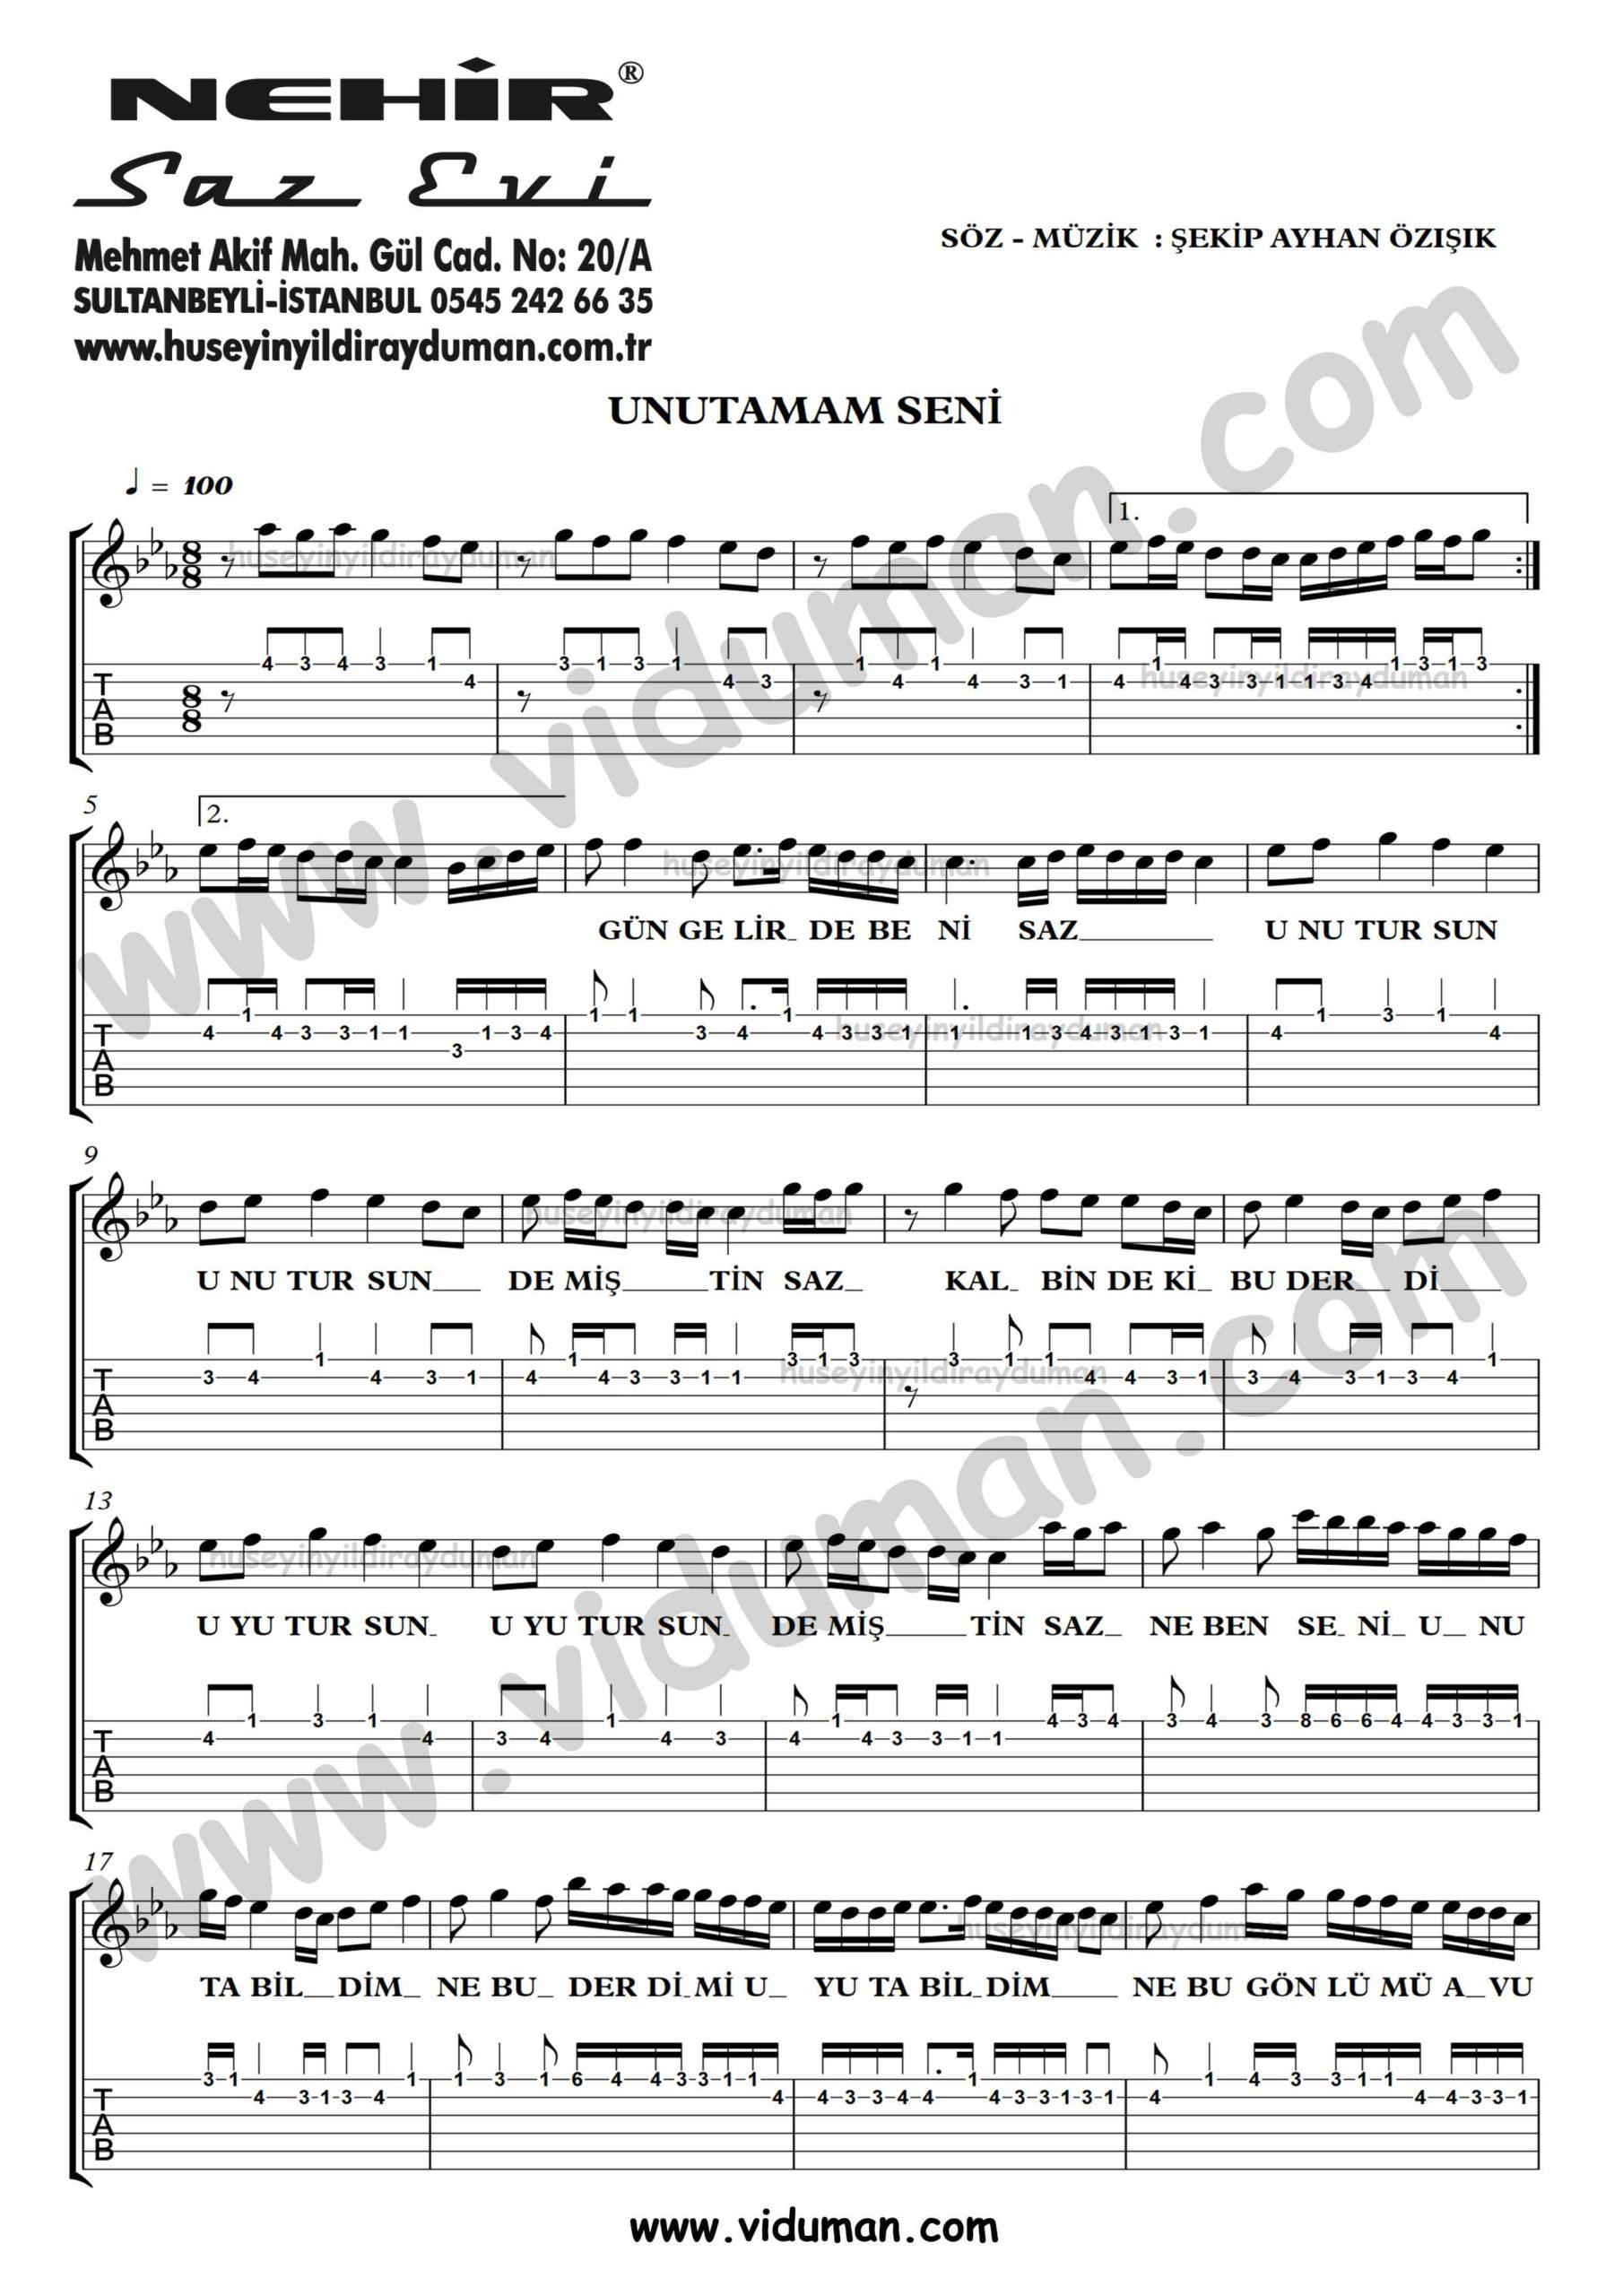 Unutamam Seni_1-Ahmet Kaya-Gitar Tab-Solo Notalari